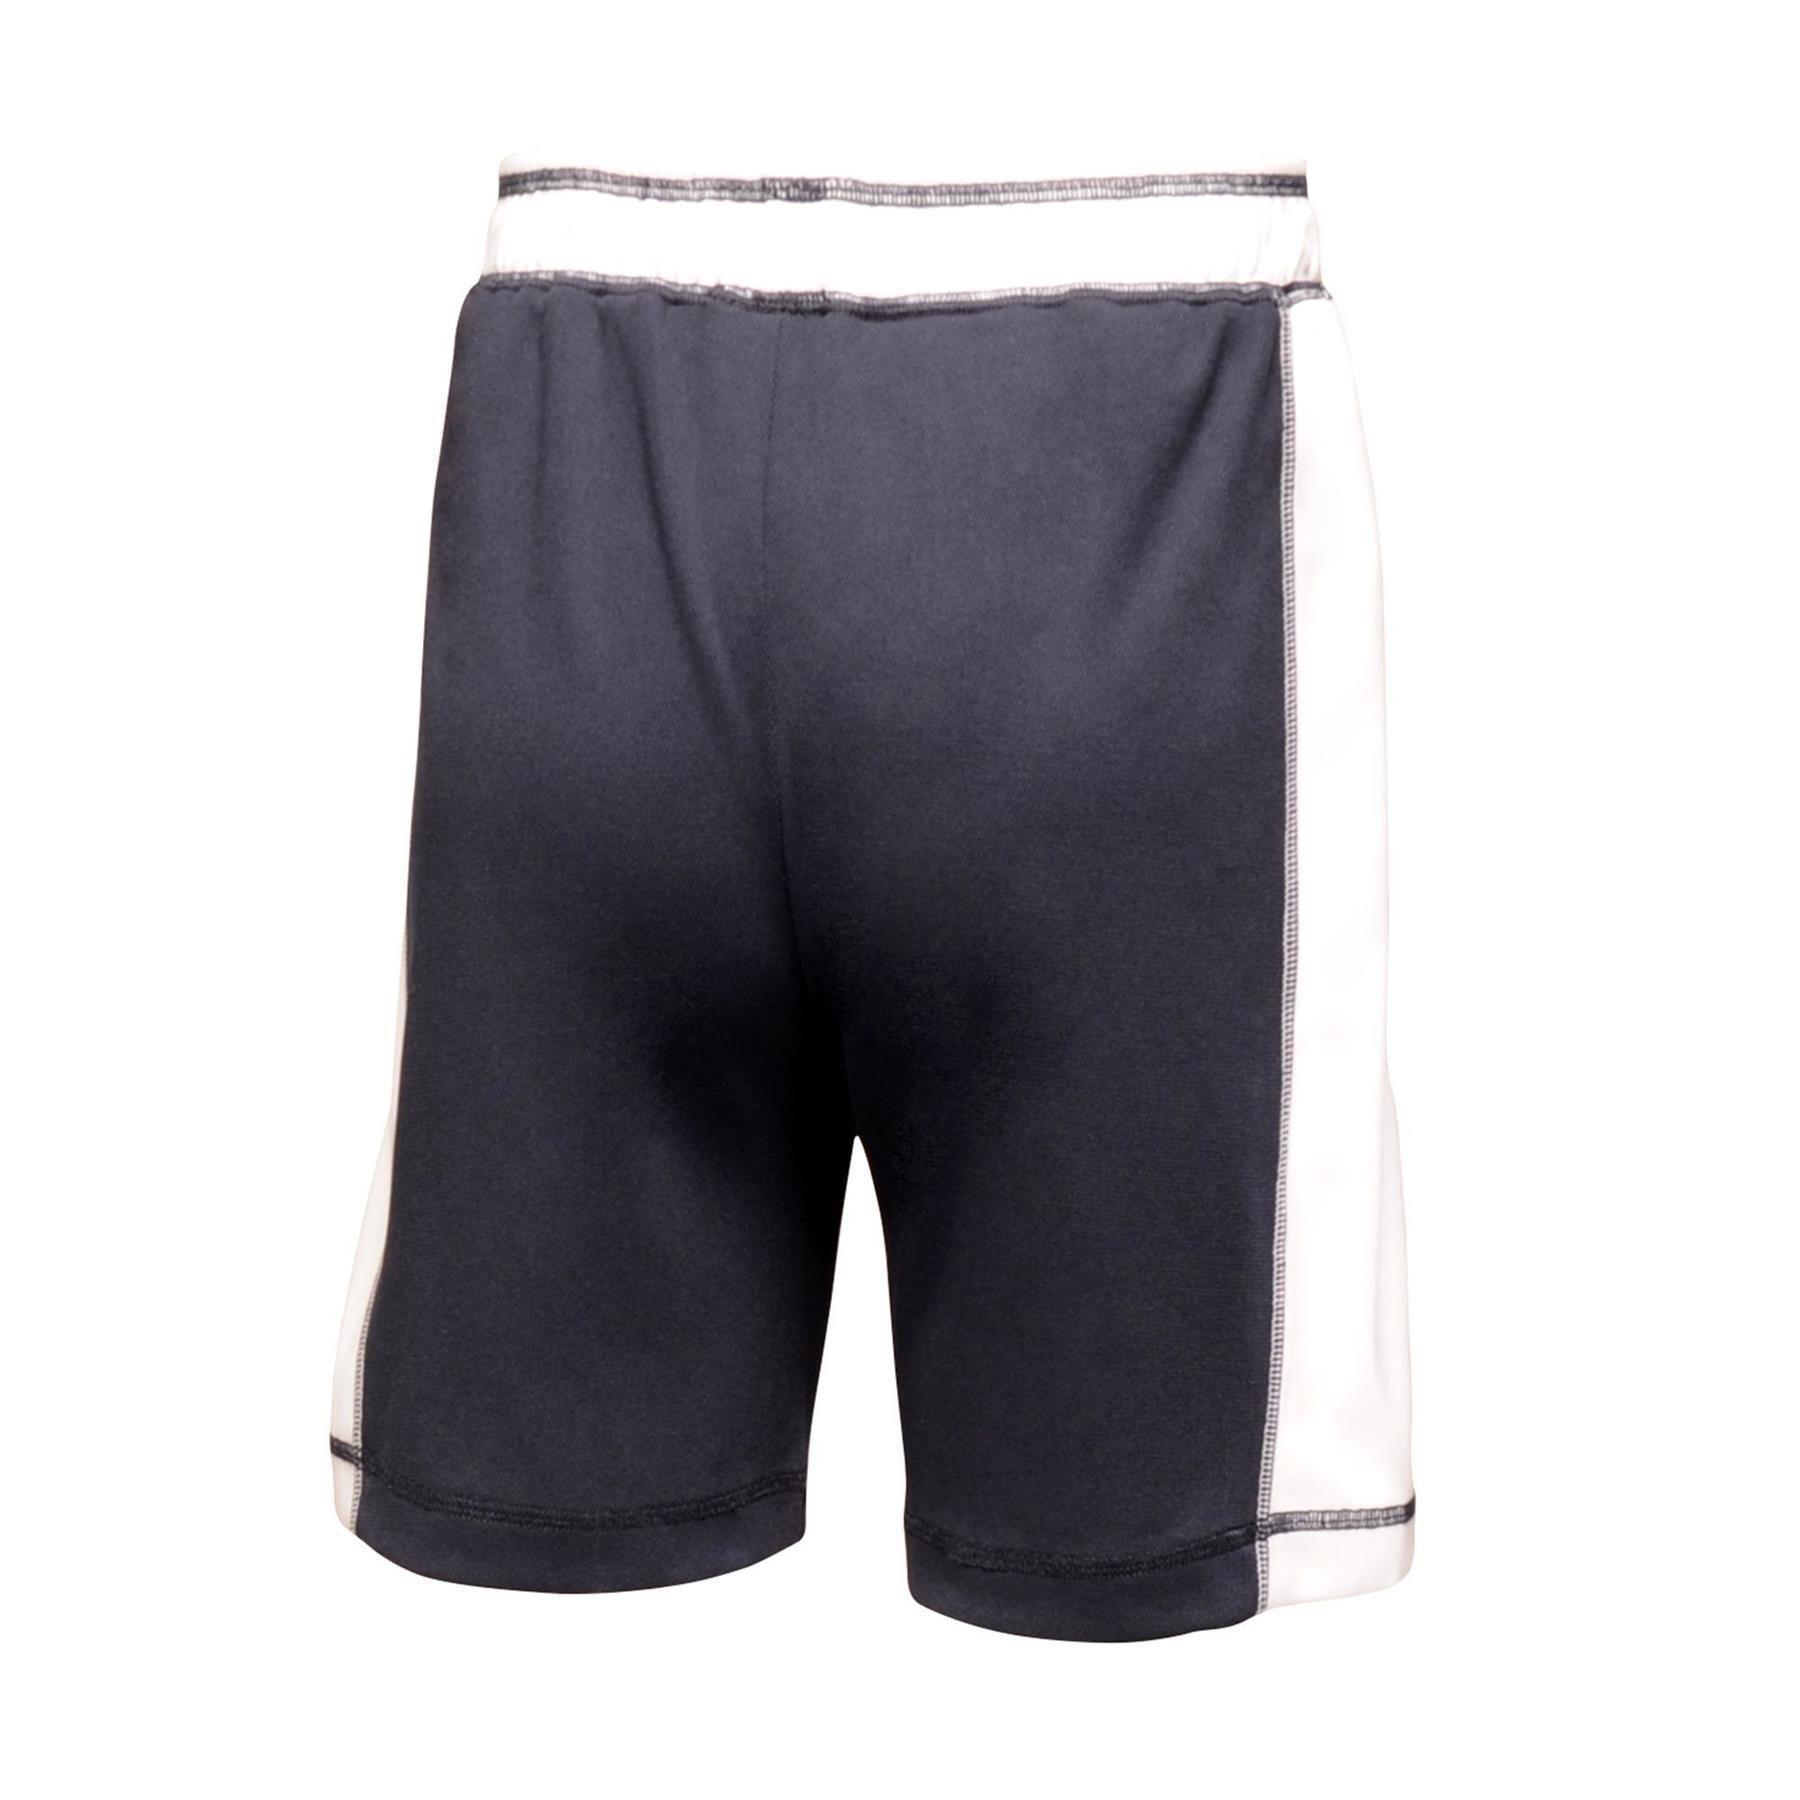 miniatuur 6 - Regatta Kids Tokyo Drawstring Shorts Quick Dry Anti Bacterial Football Boys